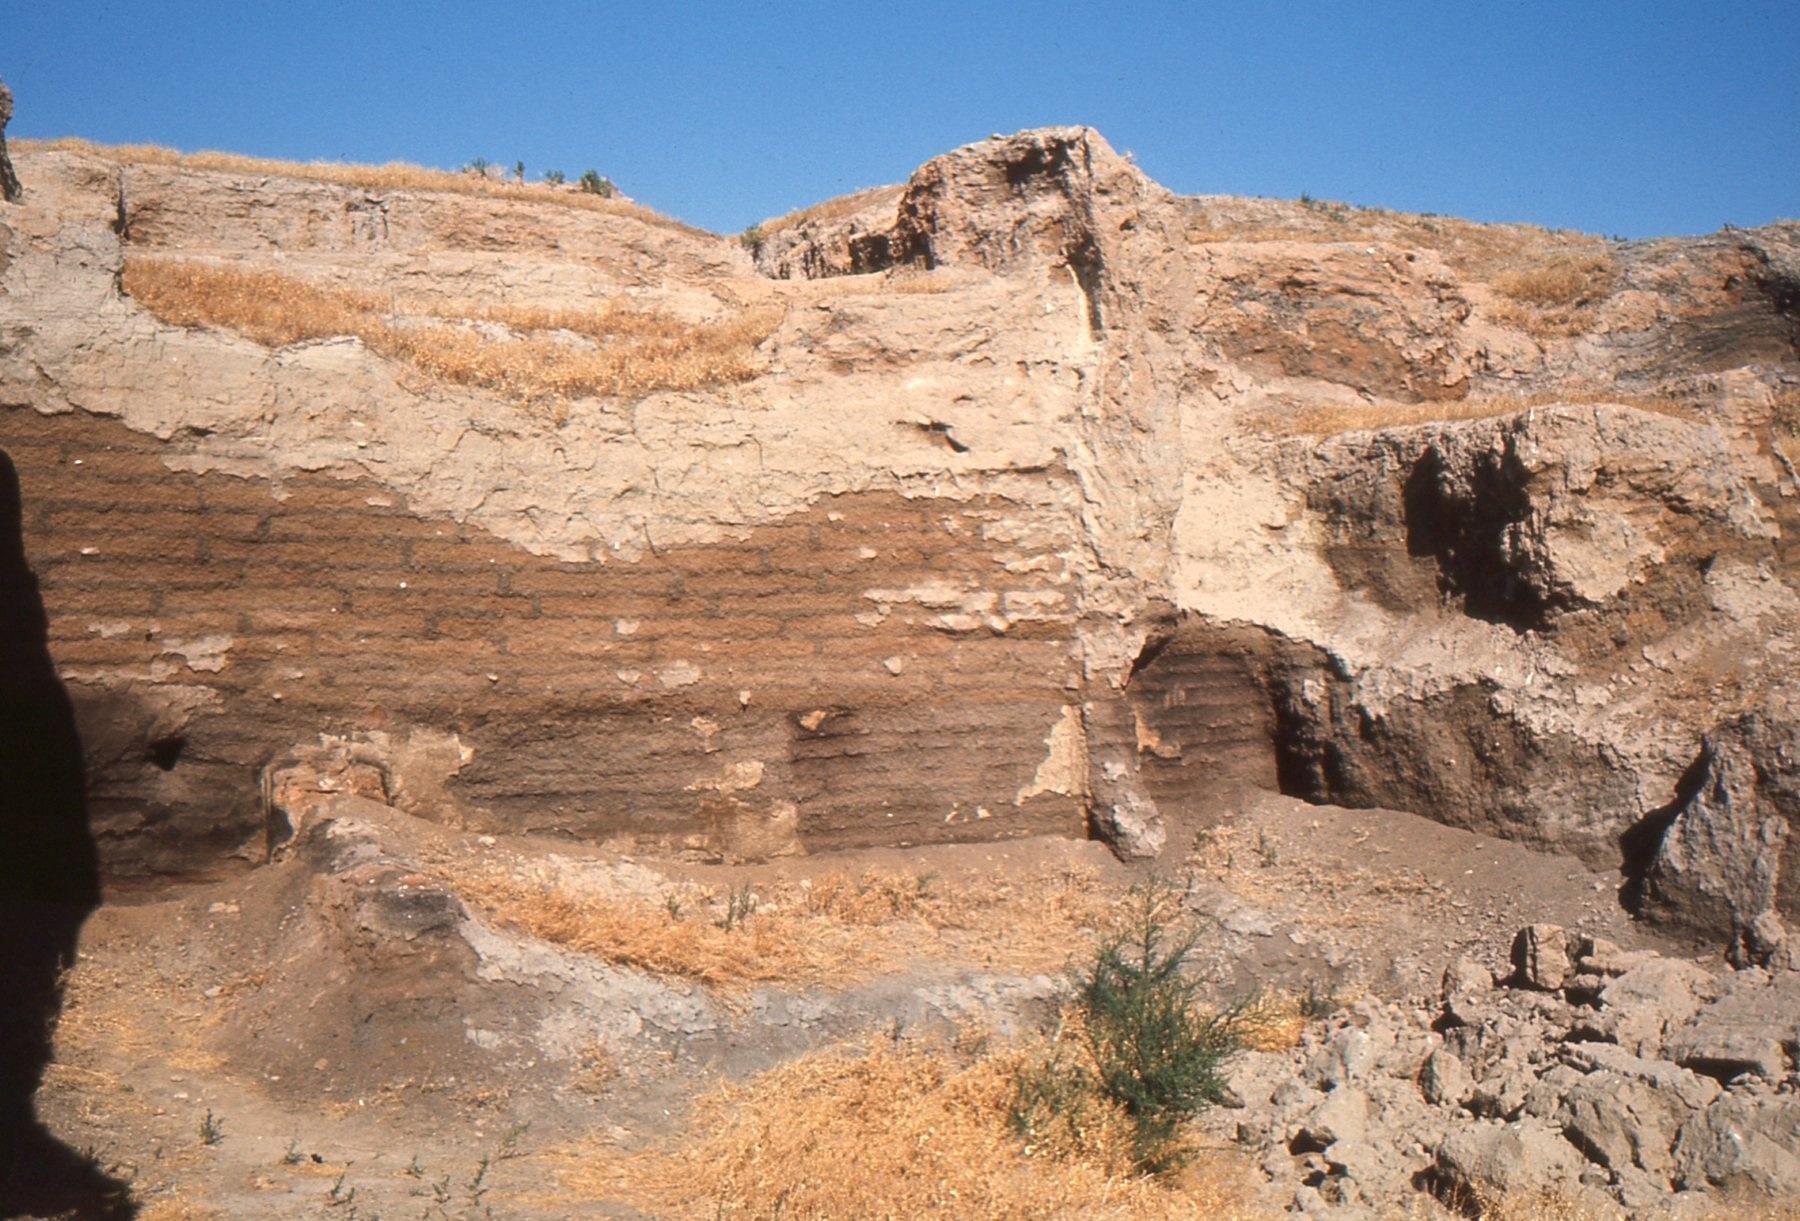 File:Çatalhöyük excavations ..jpg - Wikimedia Commons